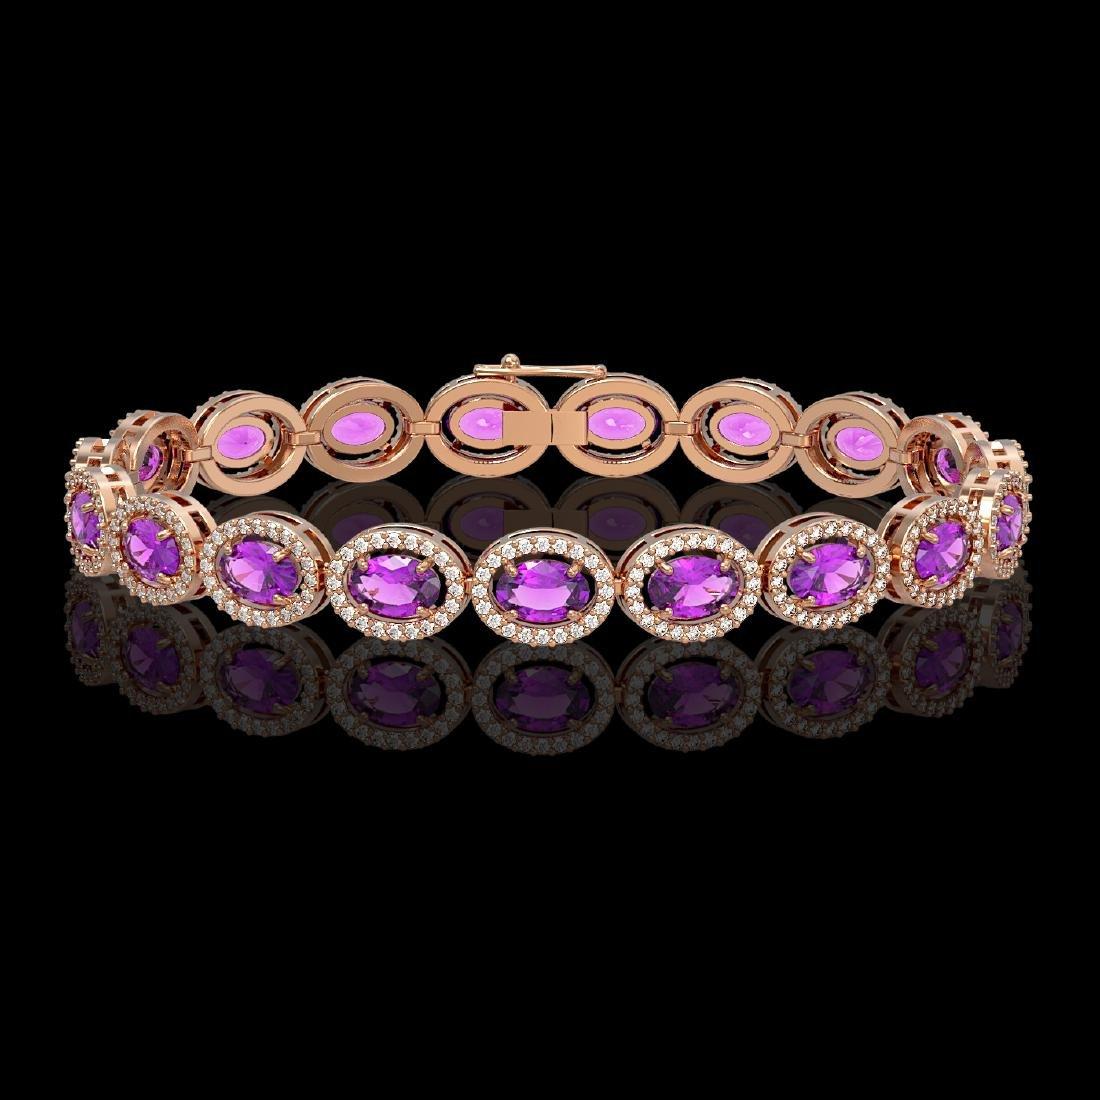 13.11 CTW Amethyst & Diamond Halo Bracelet 10K Rose